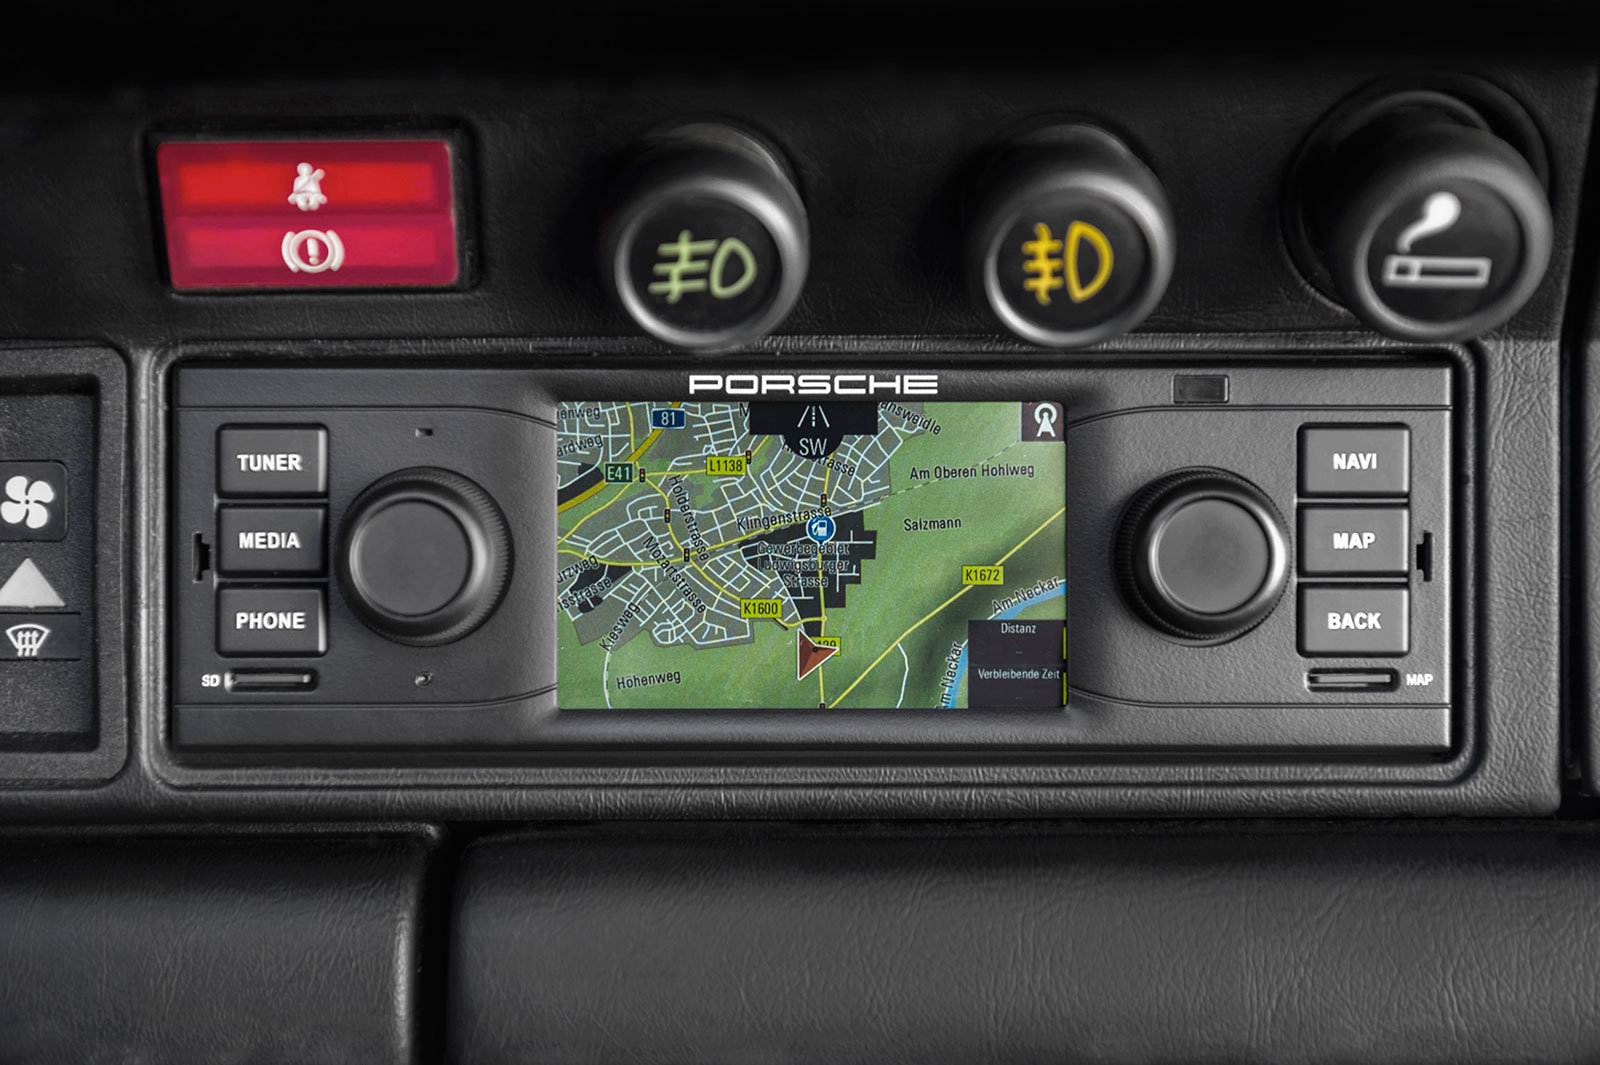 Porsche Classic 911 dashboard mounted navigation radio